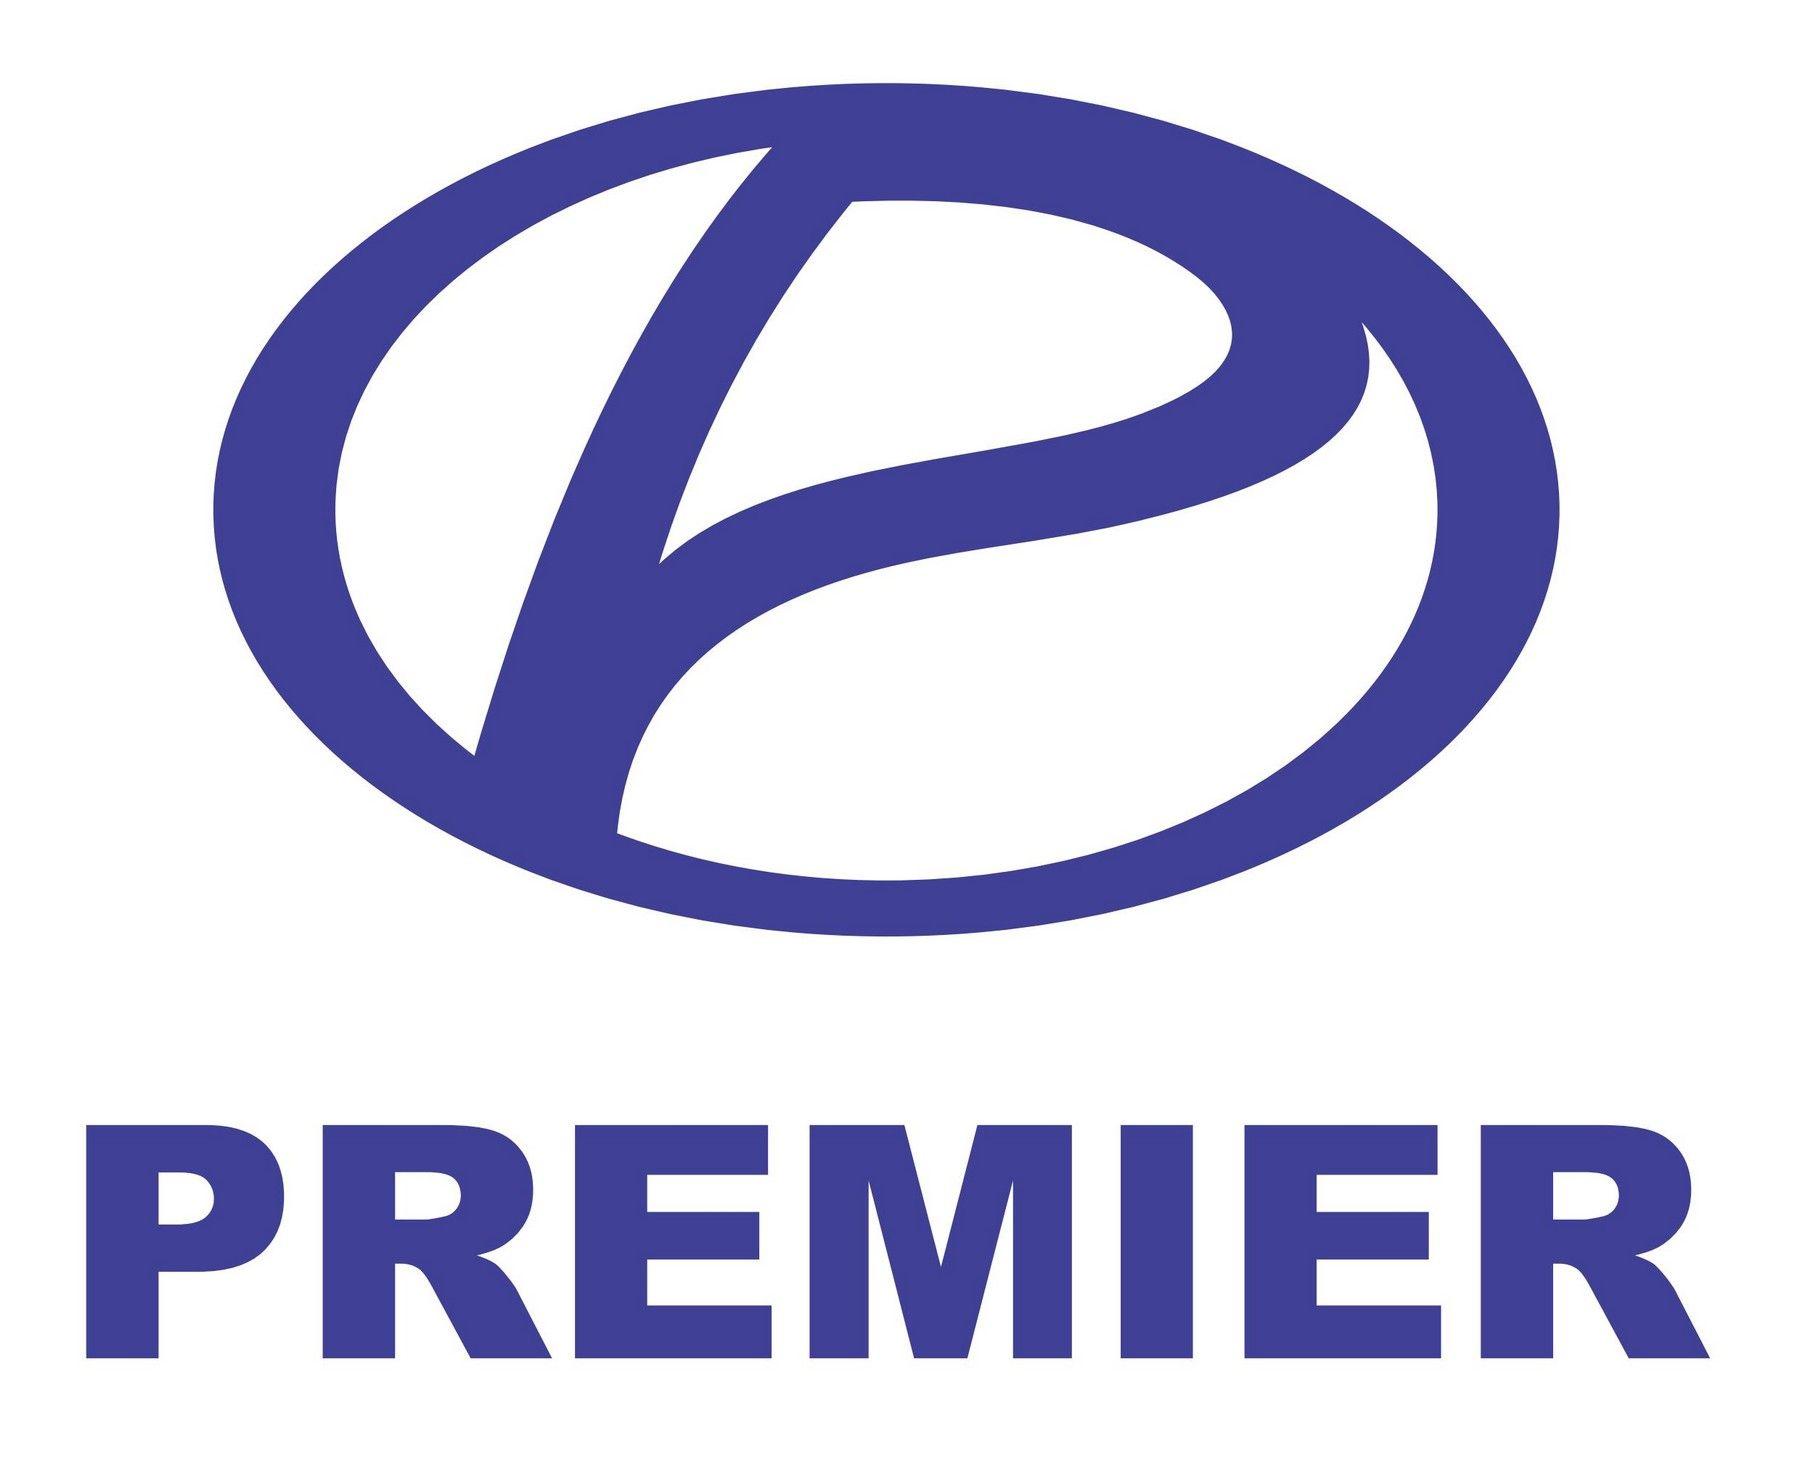 premier automobiles logo eps pdf car and motorcycle logos rh pinterest com Auto Repair Business Logo Design Car Auto Repair Logo